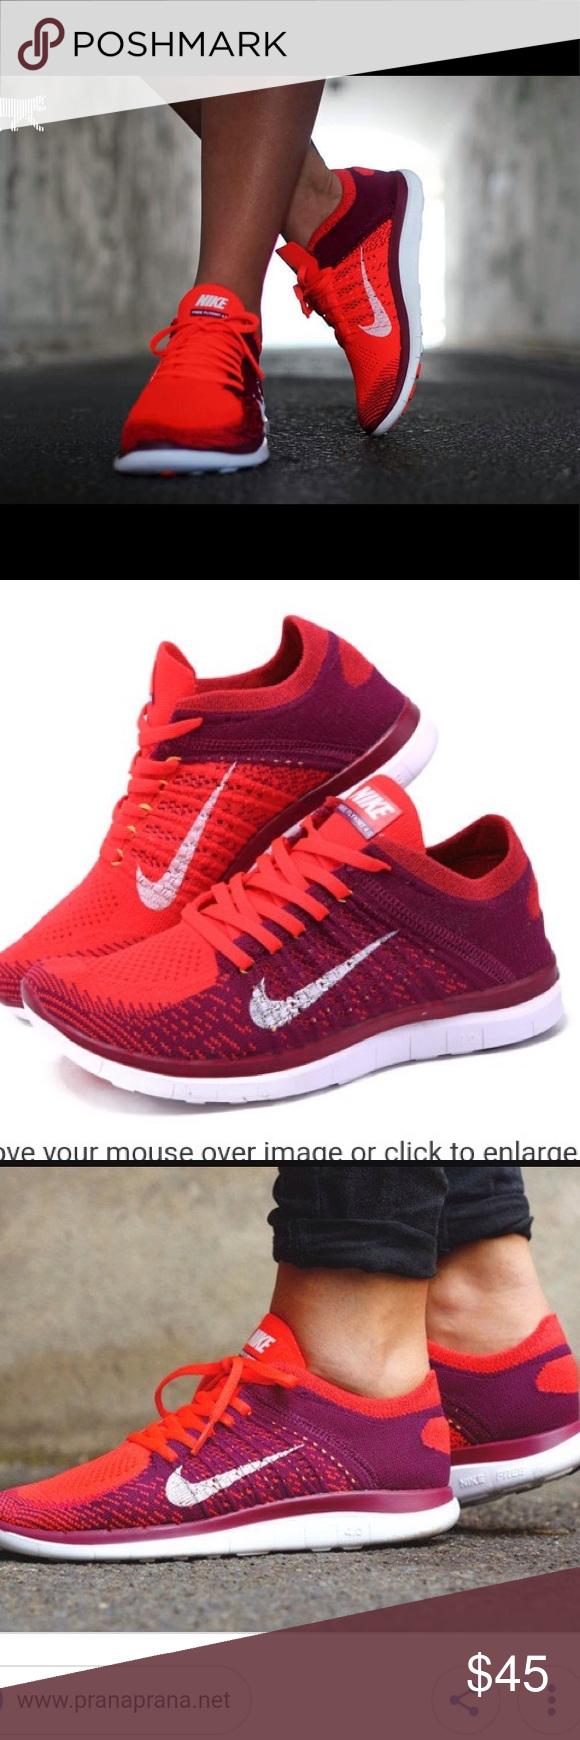 "f8b02f7fcd2e Nike Free Flyknit 4.0 ""Bright Crimson""❤ Nike Free Flyknit 4.0 ""Bright  Crimson"" Bright Crimson White Raspberry Red SKU  631050-616 Price   150  Nike Shoes ..."